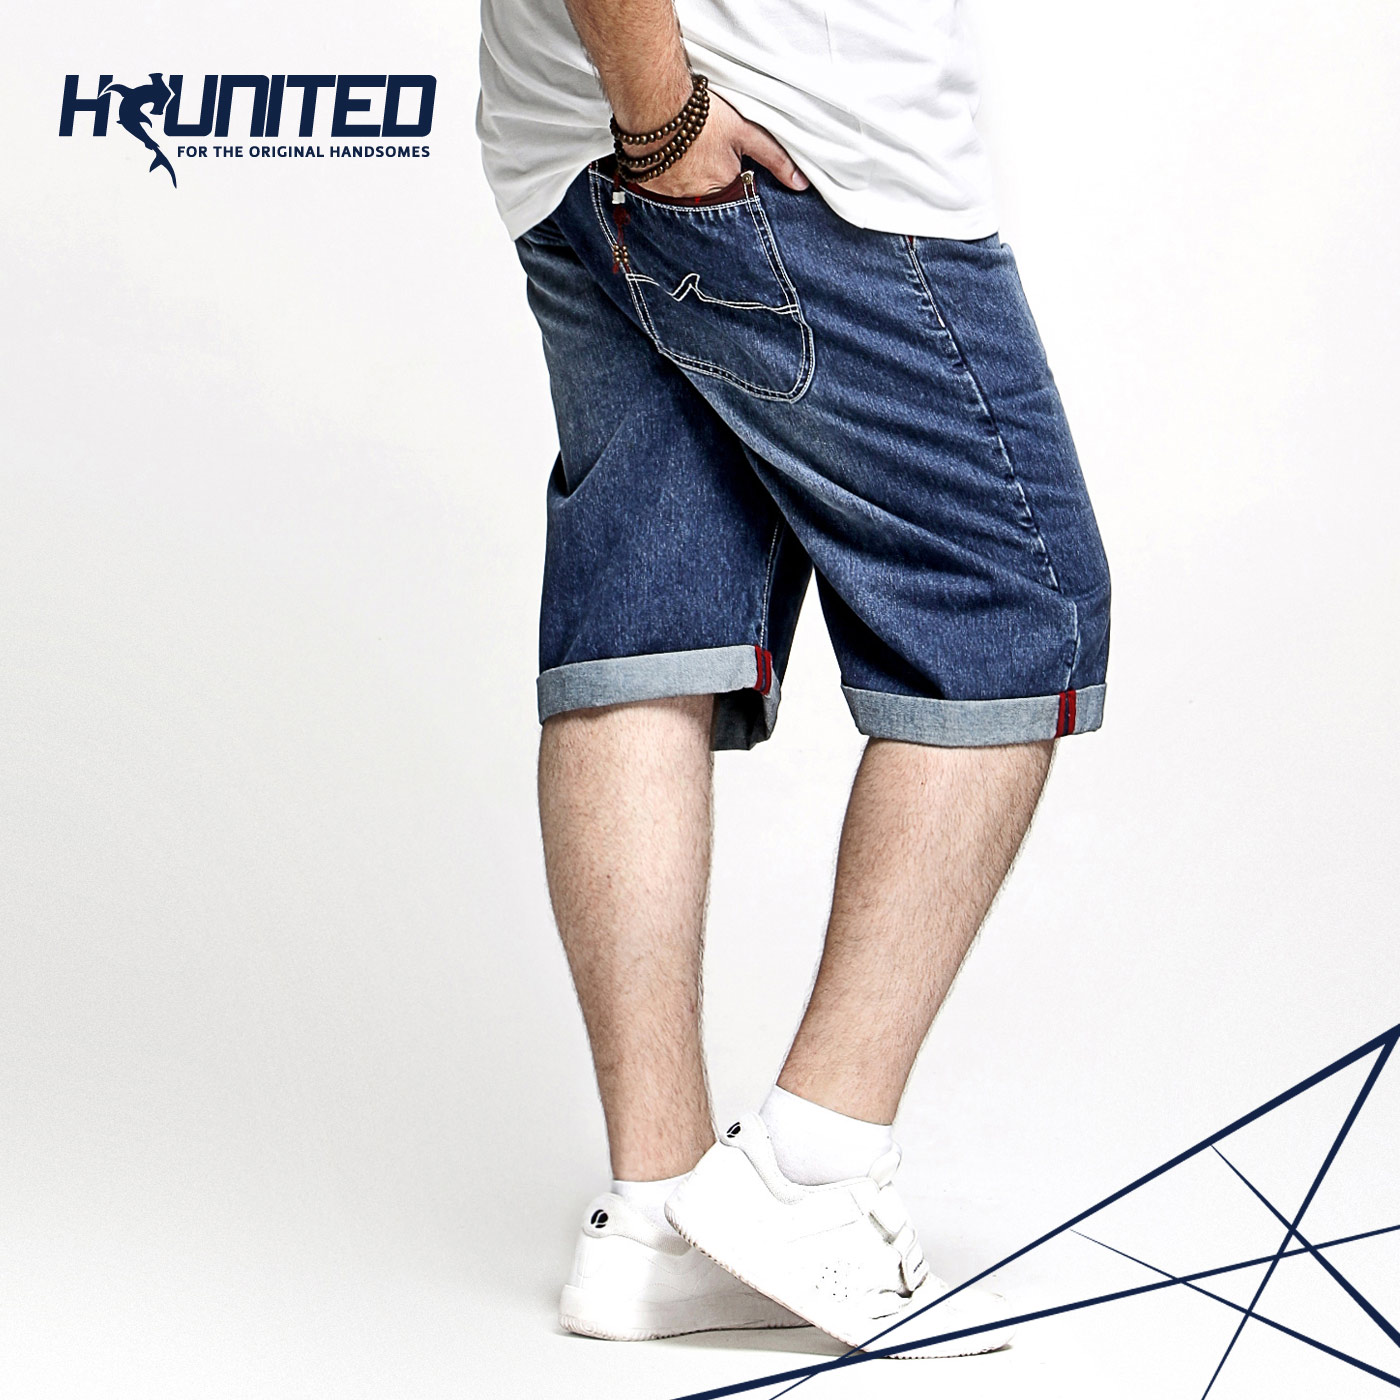 H-UNITED巨鲨特大码男装休闲迷彩撞色牛仔短裤男加肥加大男士中裤